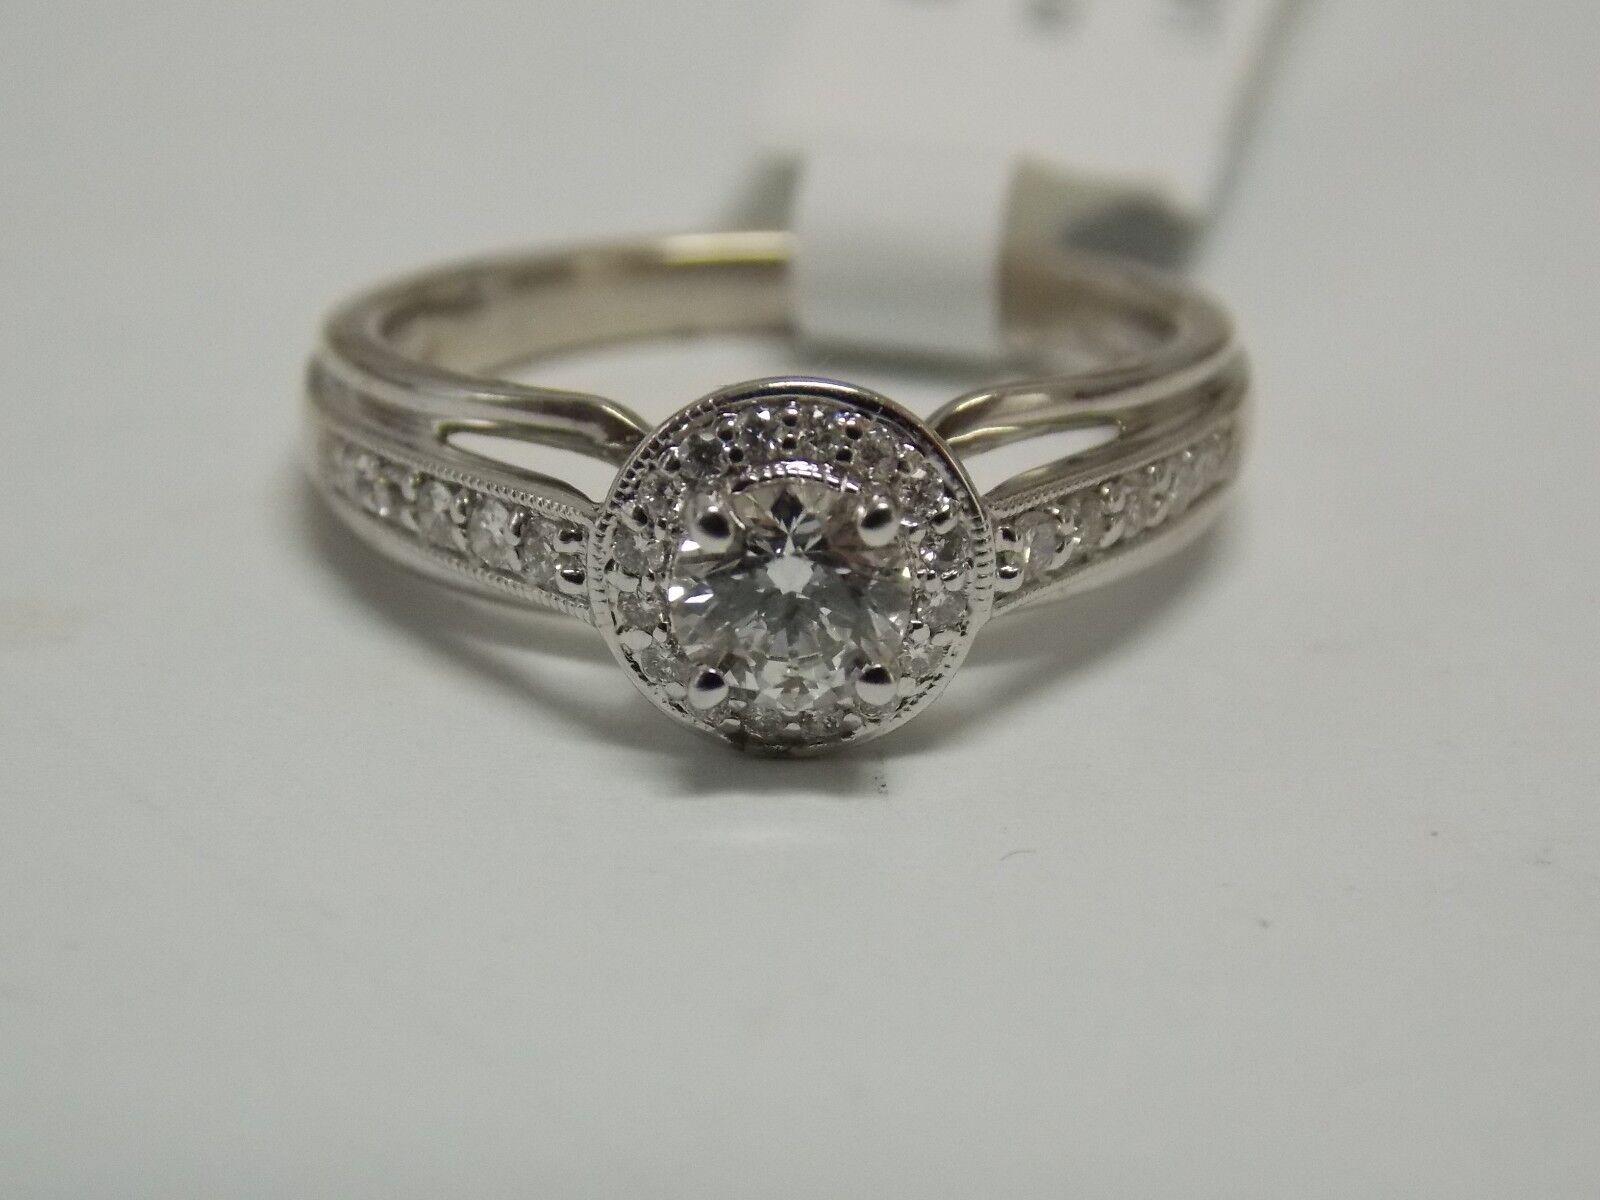 Fashion Diamond Engagement Ring Halo Settings on 14K White gold by Allura